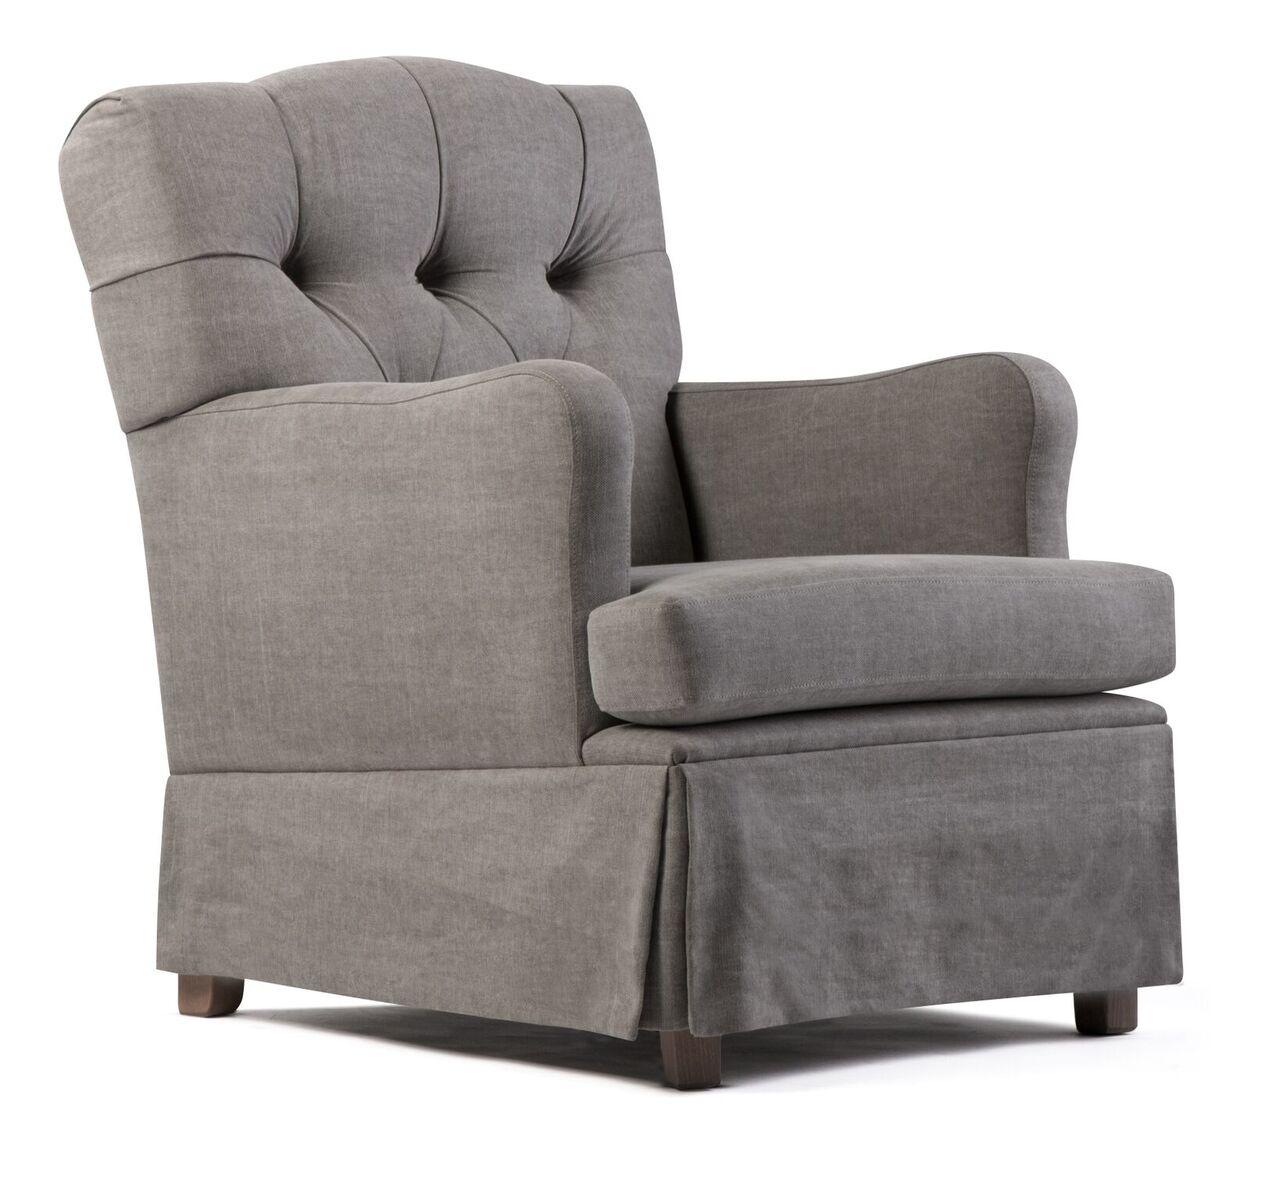 Olav Home fauteuil Aura 't Maaseiker Woonhuys